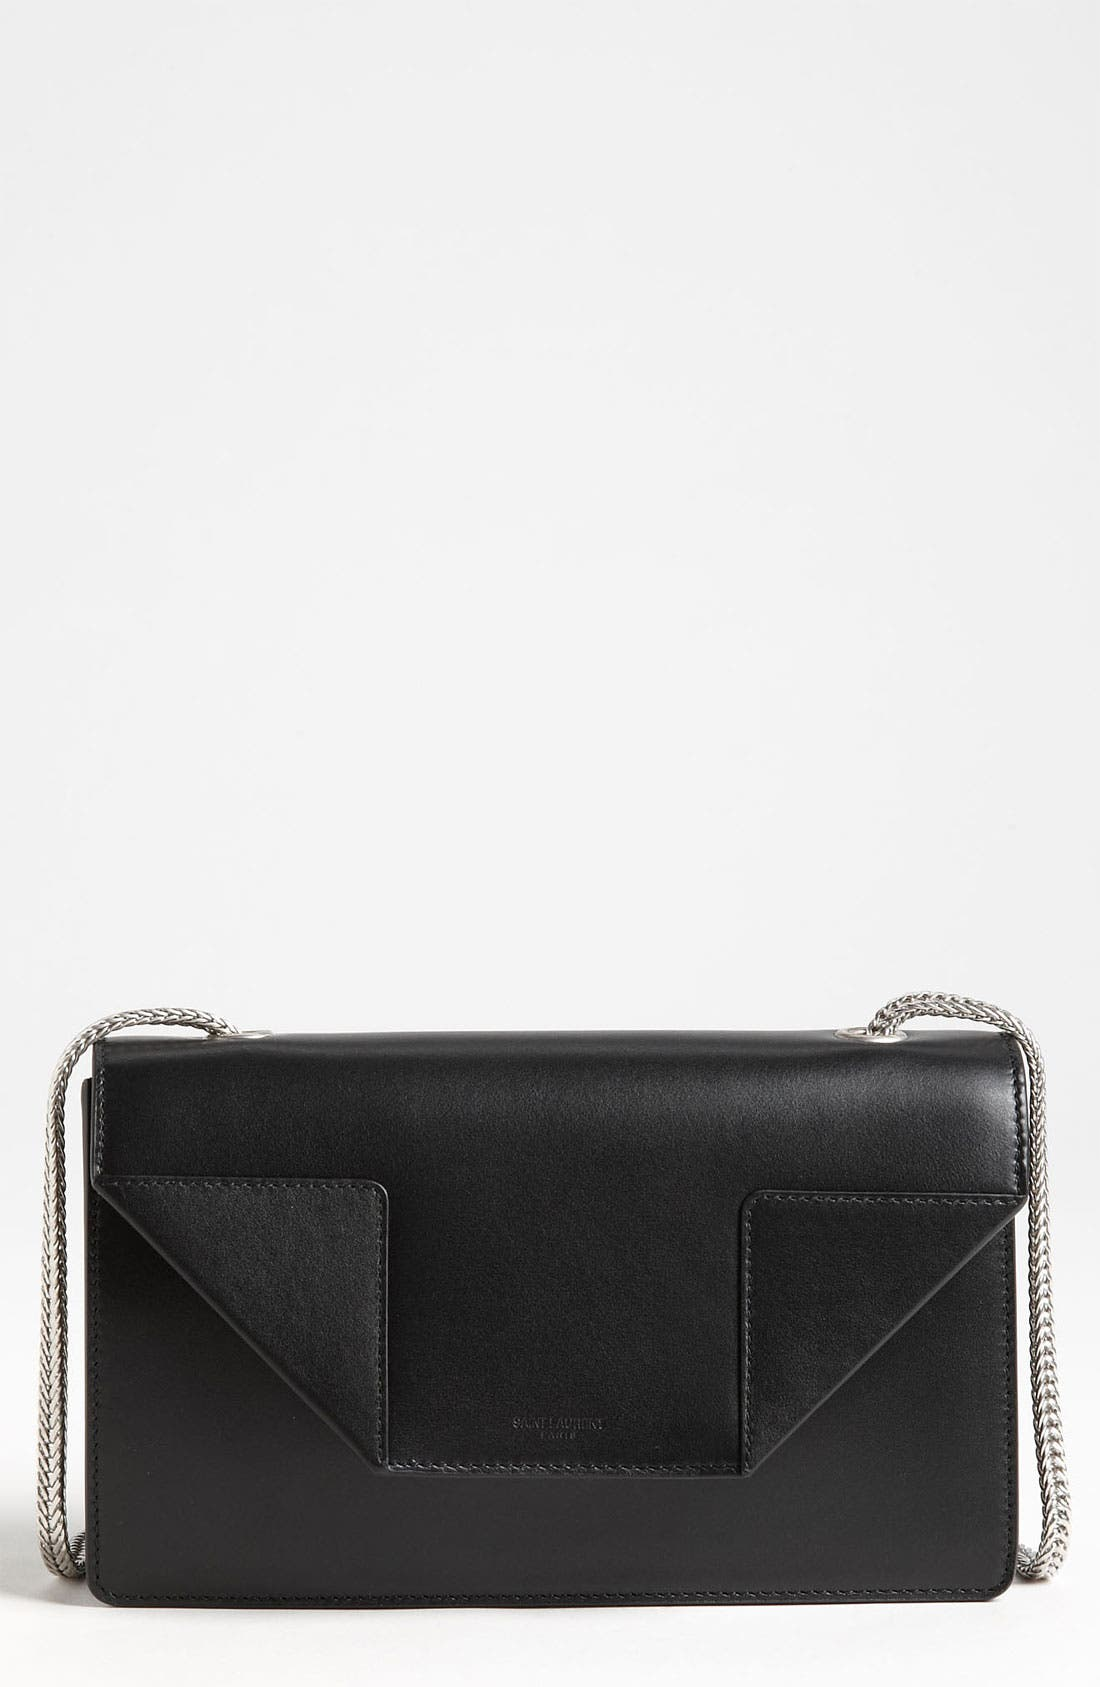 Main Image - Saint Laurent 'Betty - Mini' Shoulder Bag